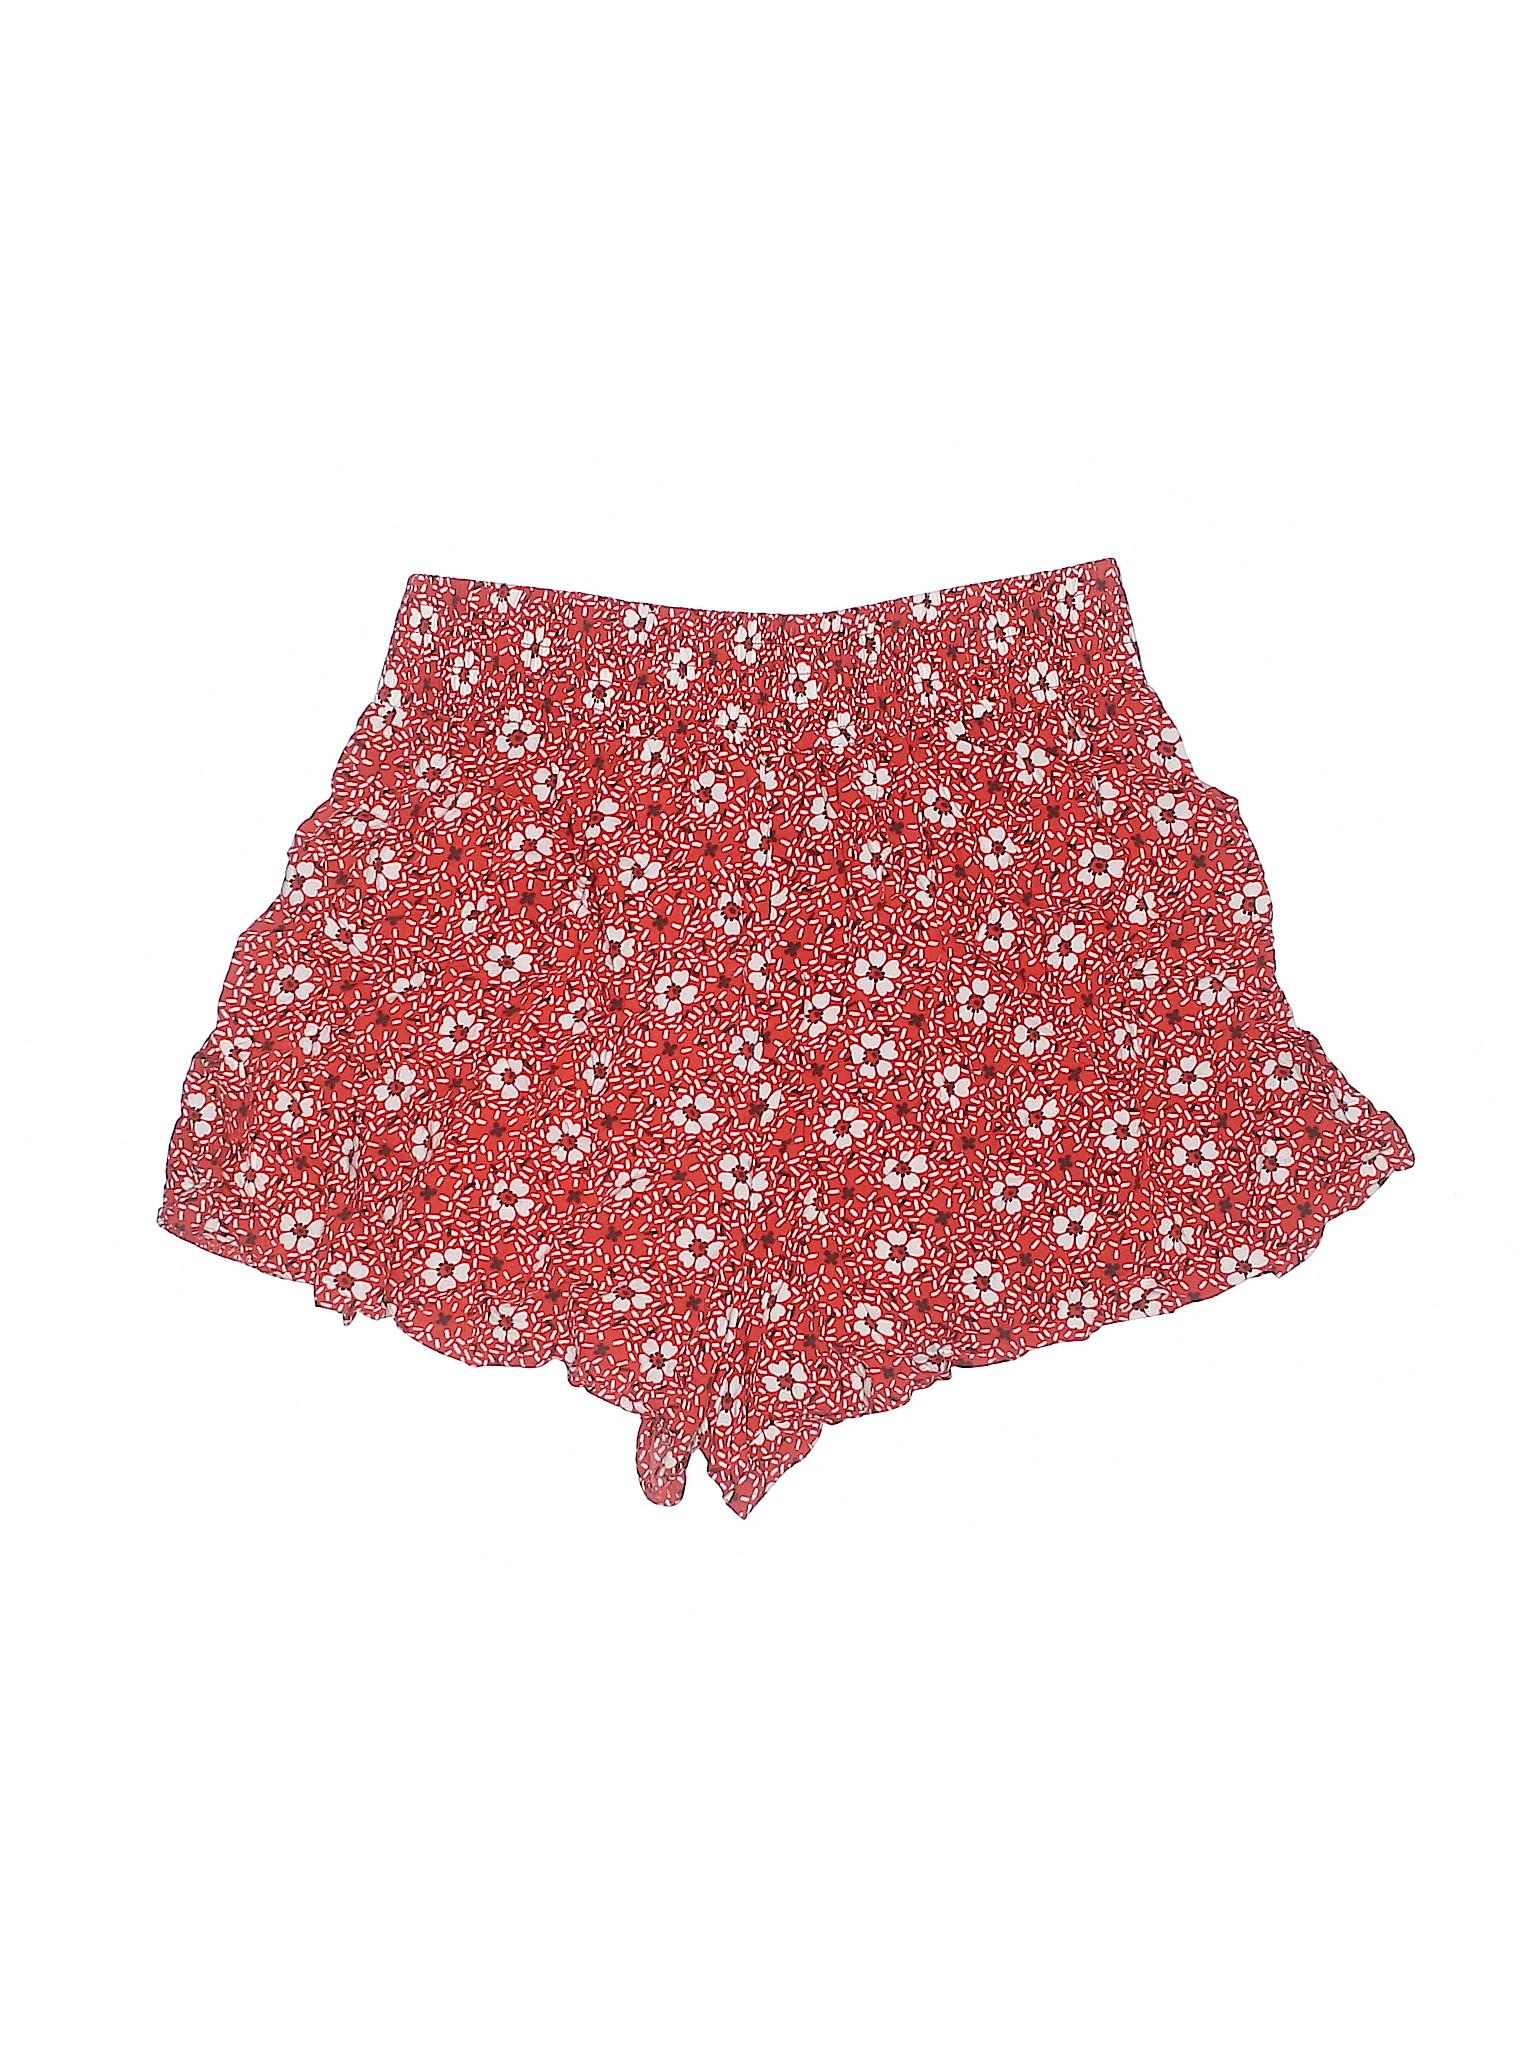 Shorts Xhilaration Boutique Boutique Xhilaration Xhilaration Shorts Boutique Boutique Xhilaration Boutique Shorts Xhilaration Boutique Shorts Shorts URHYqY